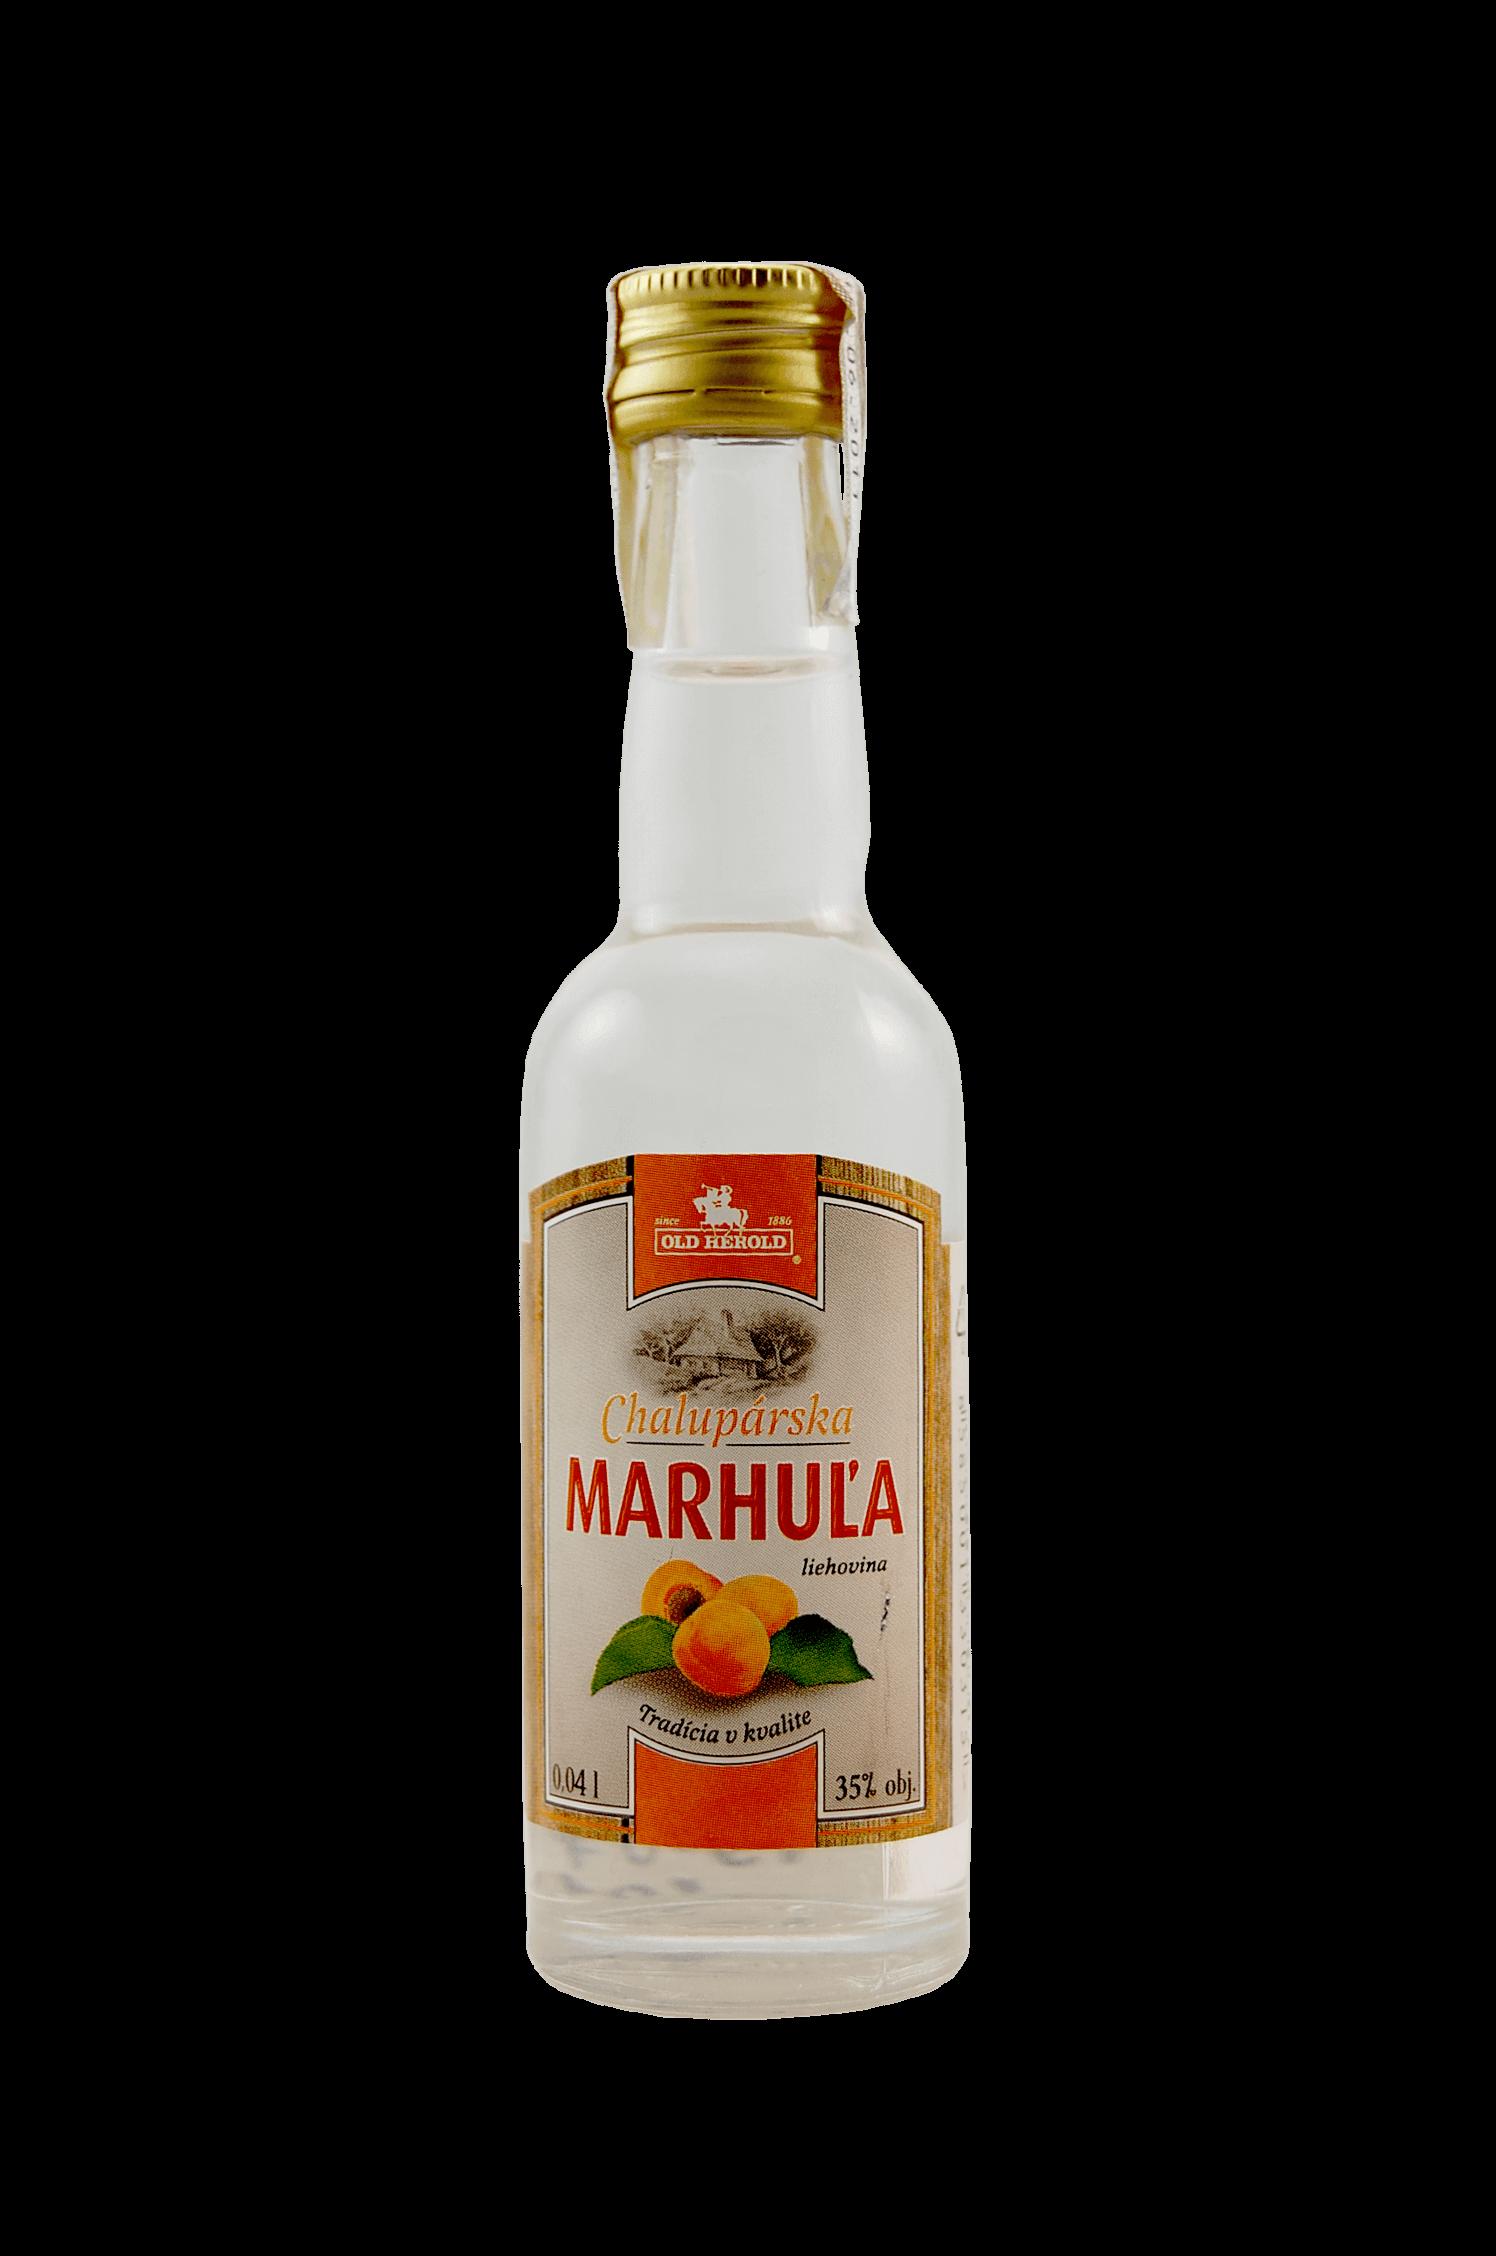 Chalupárska Marhuľa